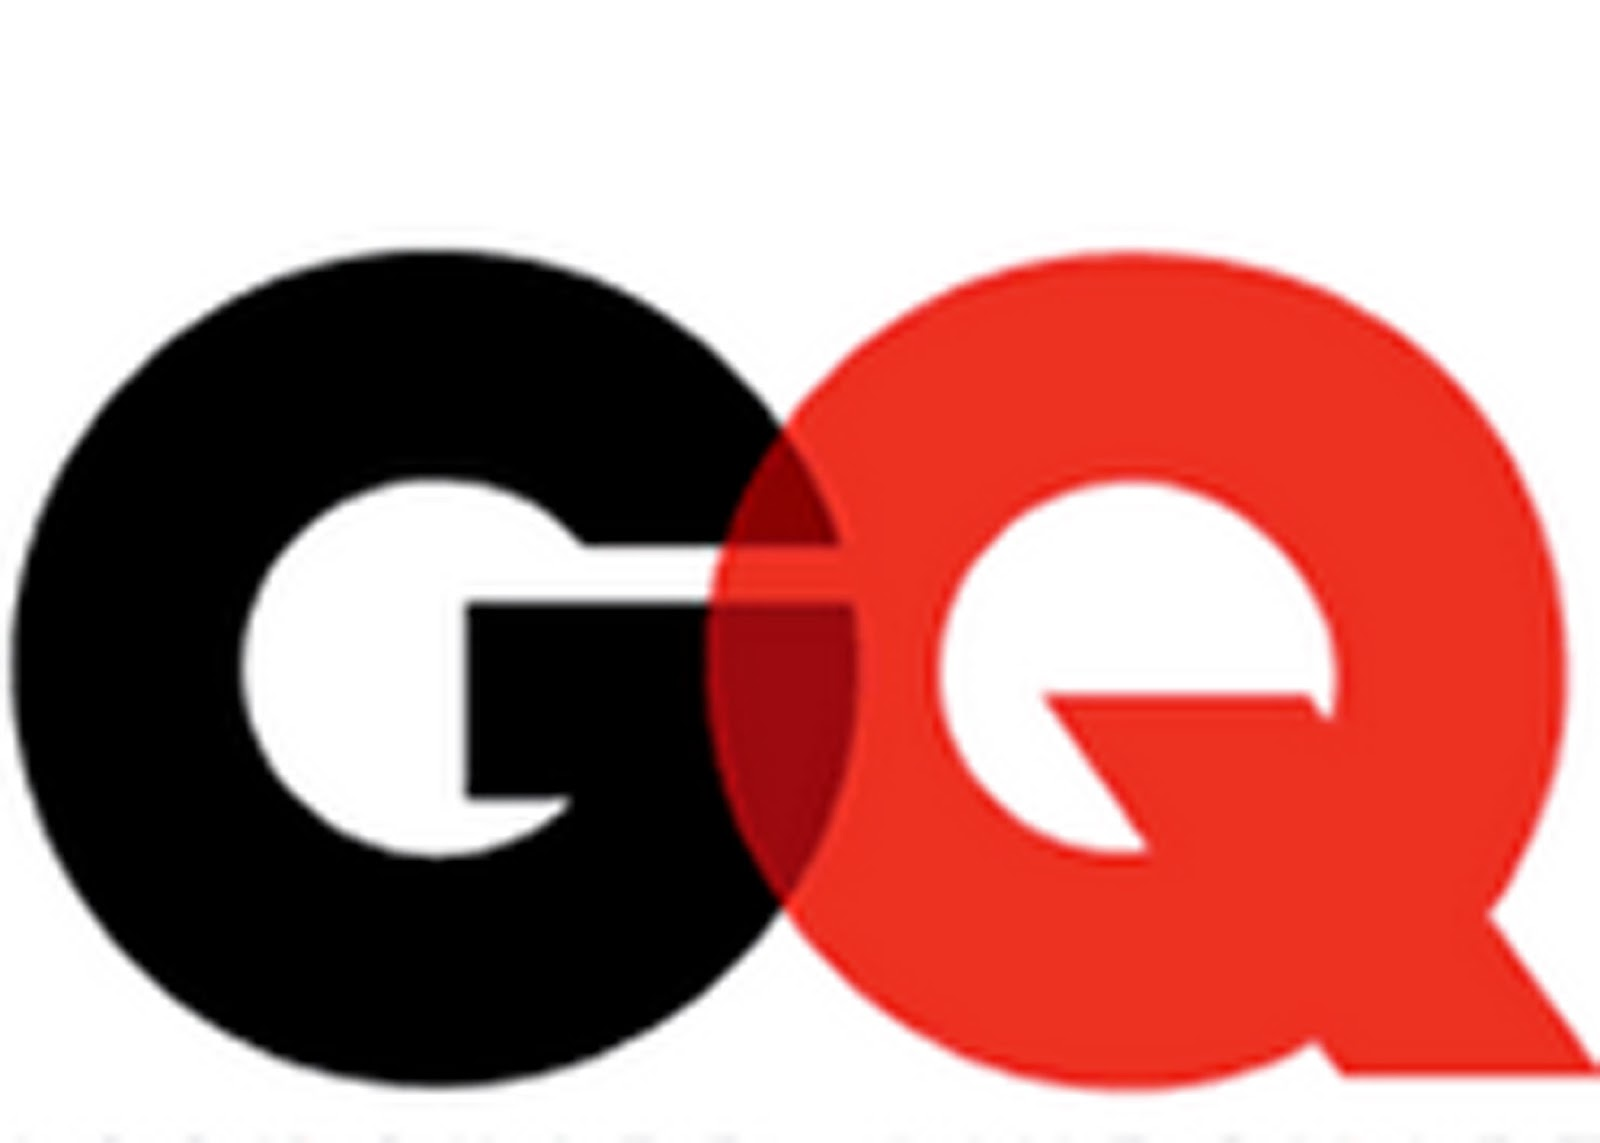 http://1.bp.blogspot.com/-l6CFzpL793I/Tbbo39vY4GI/AAAAAAAAABY/M3puJm7NLS8/s1600/gq_logo.jpg